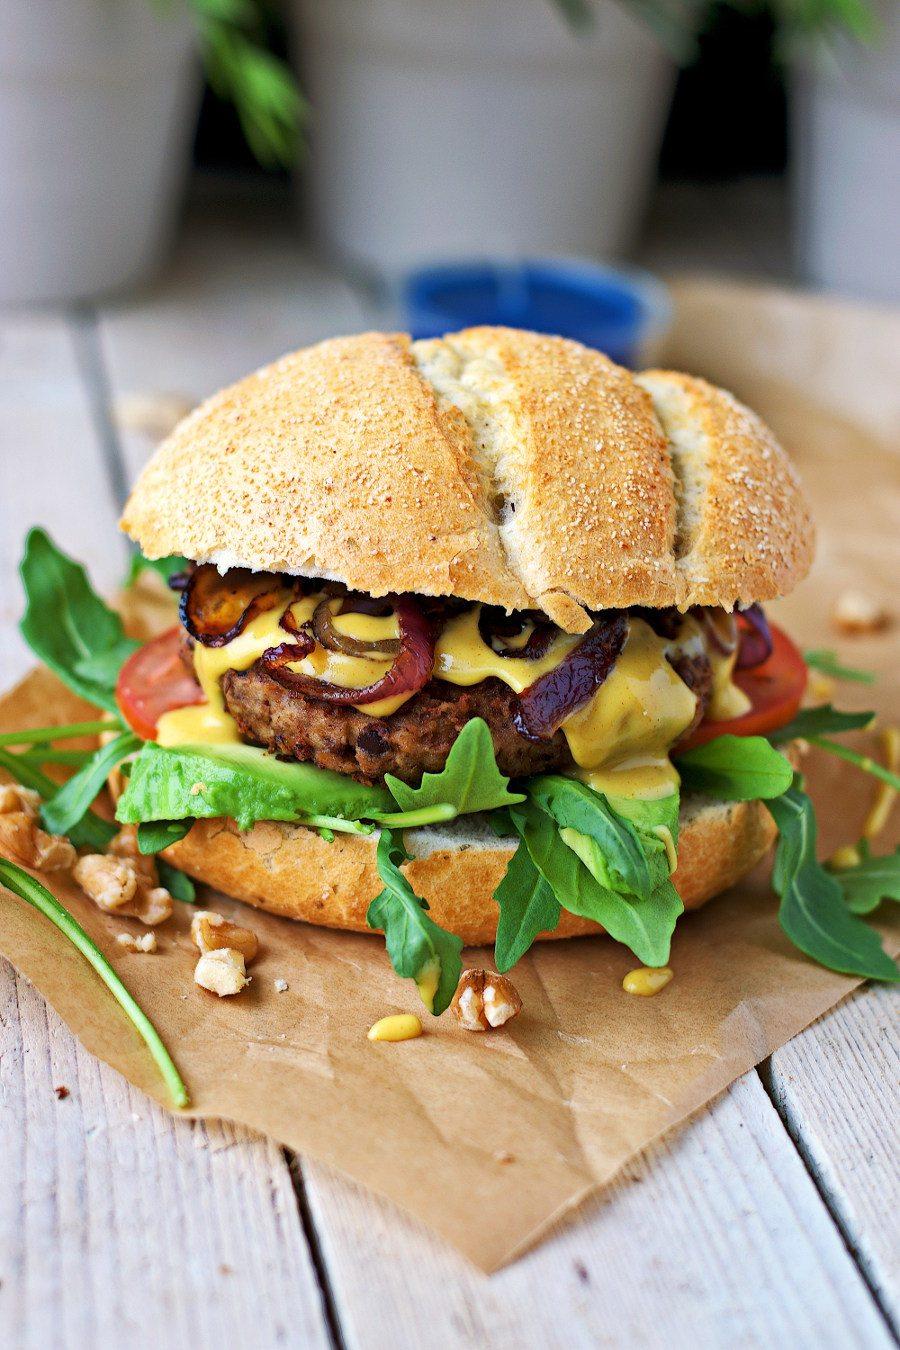 Vegan Summer Recipes to Try I Lentil Burger #Vegan #SummerRecipes